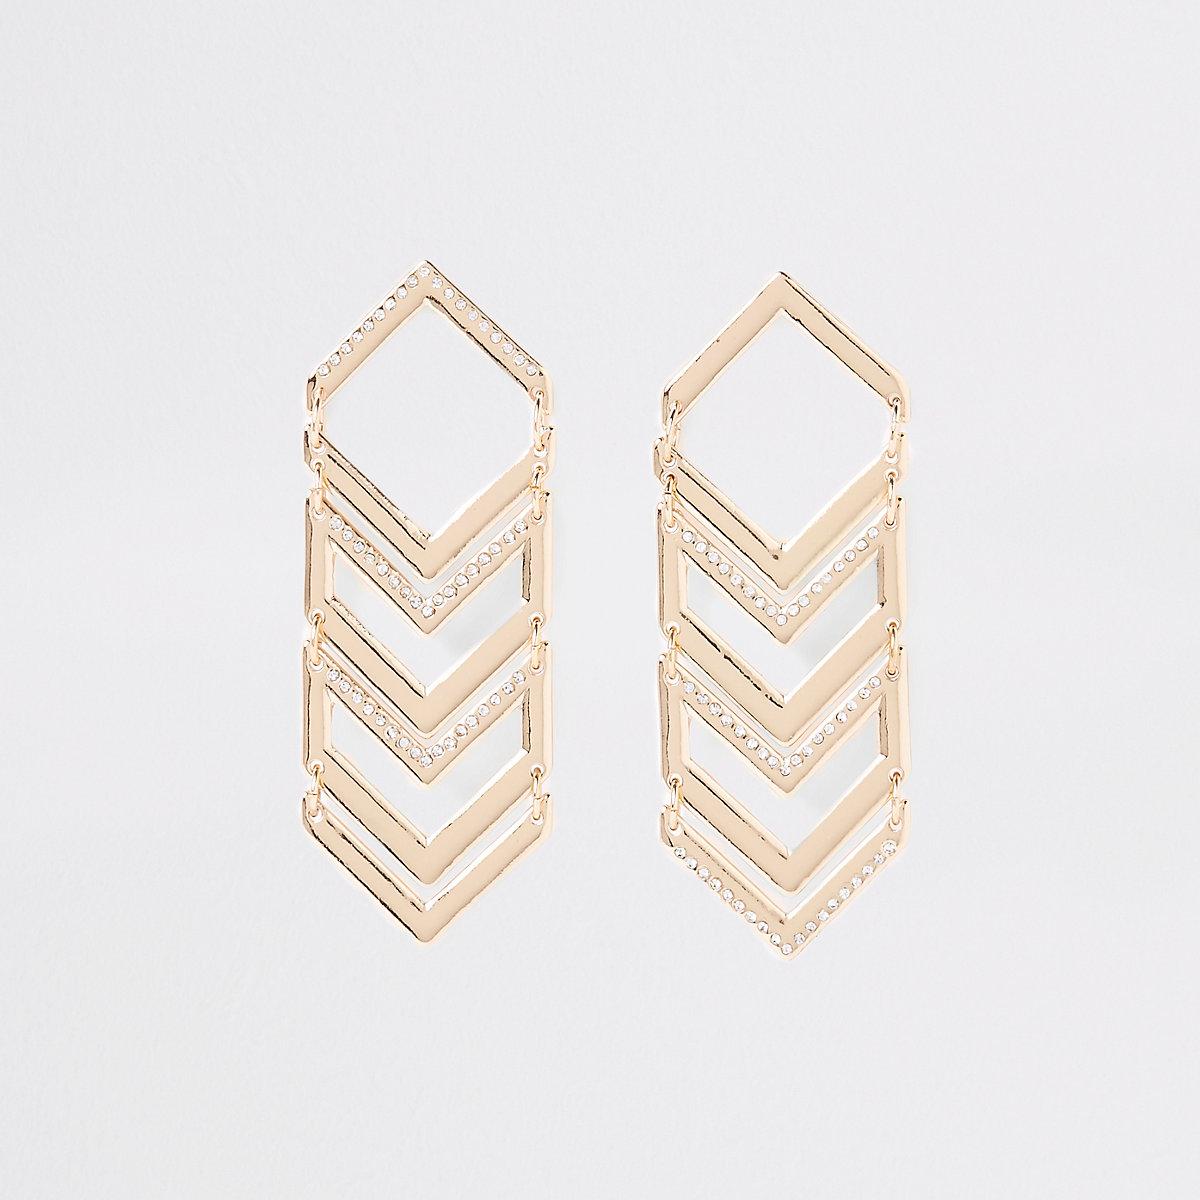 Gold tone triangular stud drop earrings